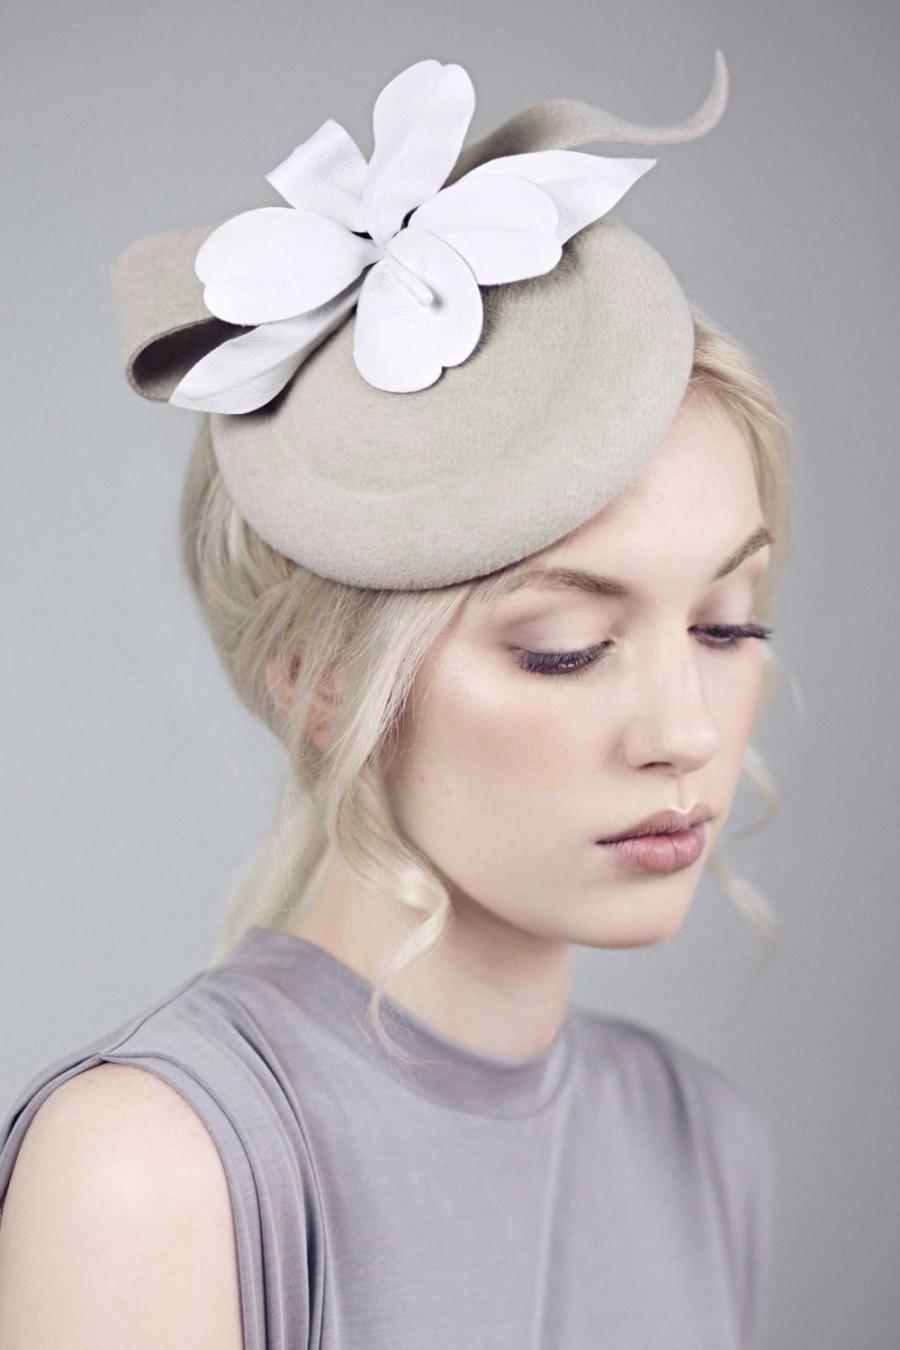 af702bcab7fff Races Hat, Mini Hat, Flower Fascinator, White Orchid, Wedding Hatinator,  SS2016 - Artemesia